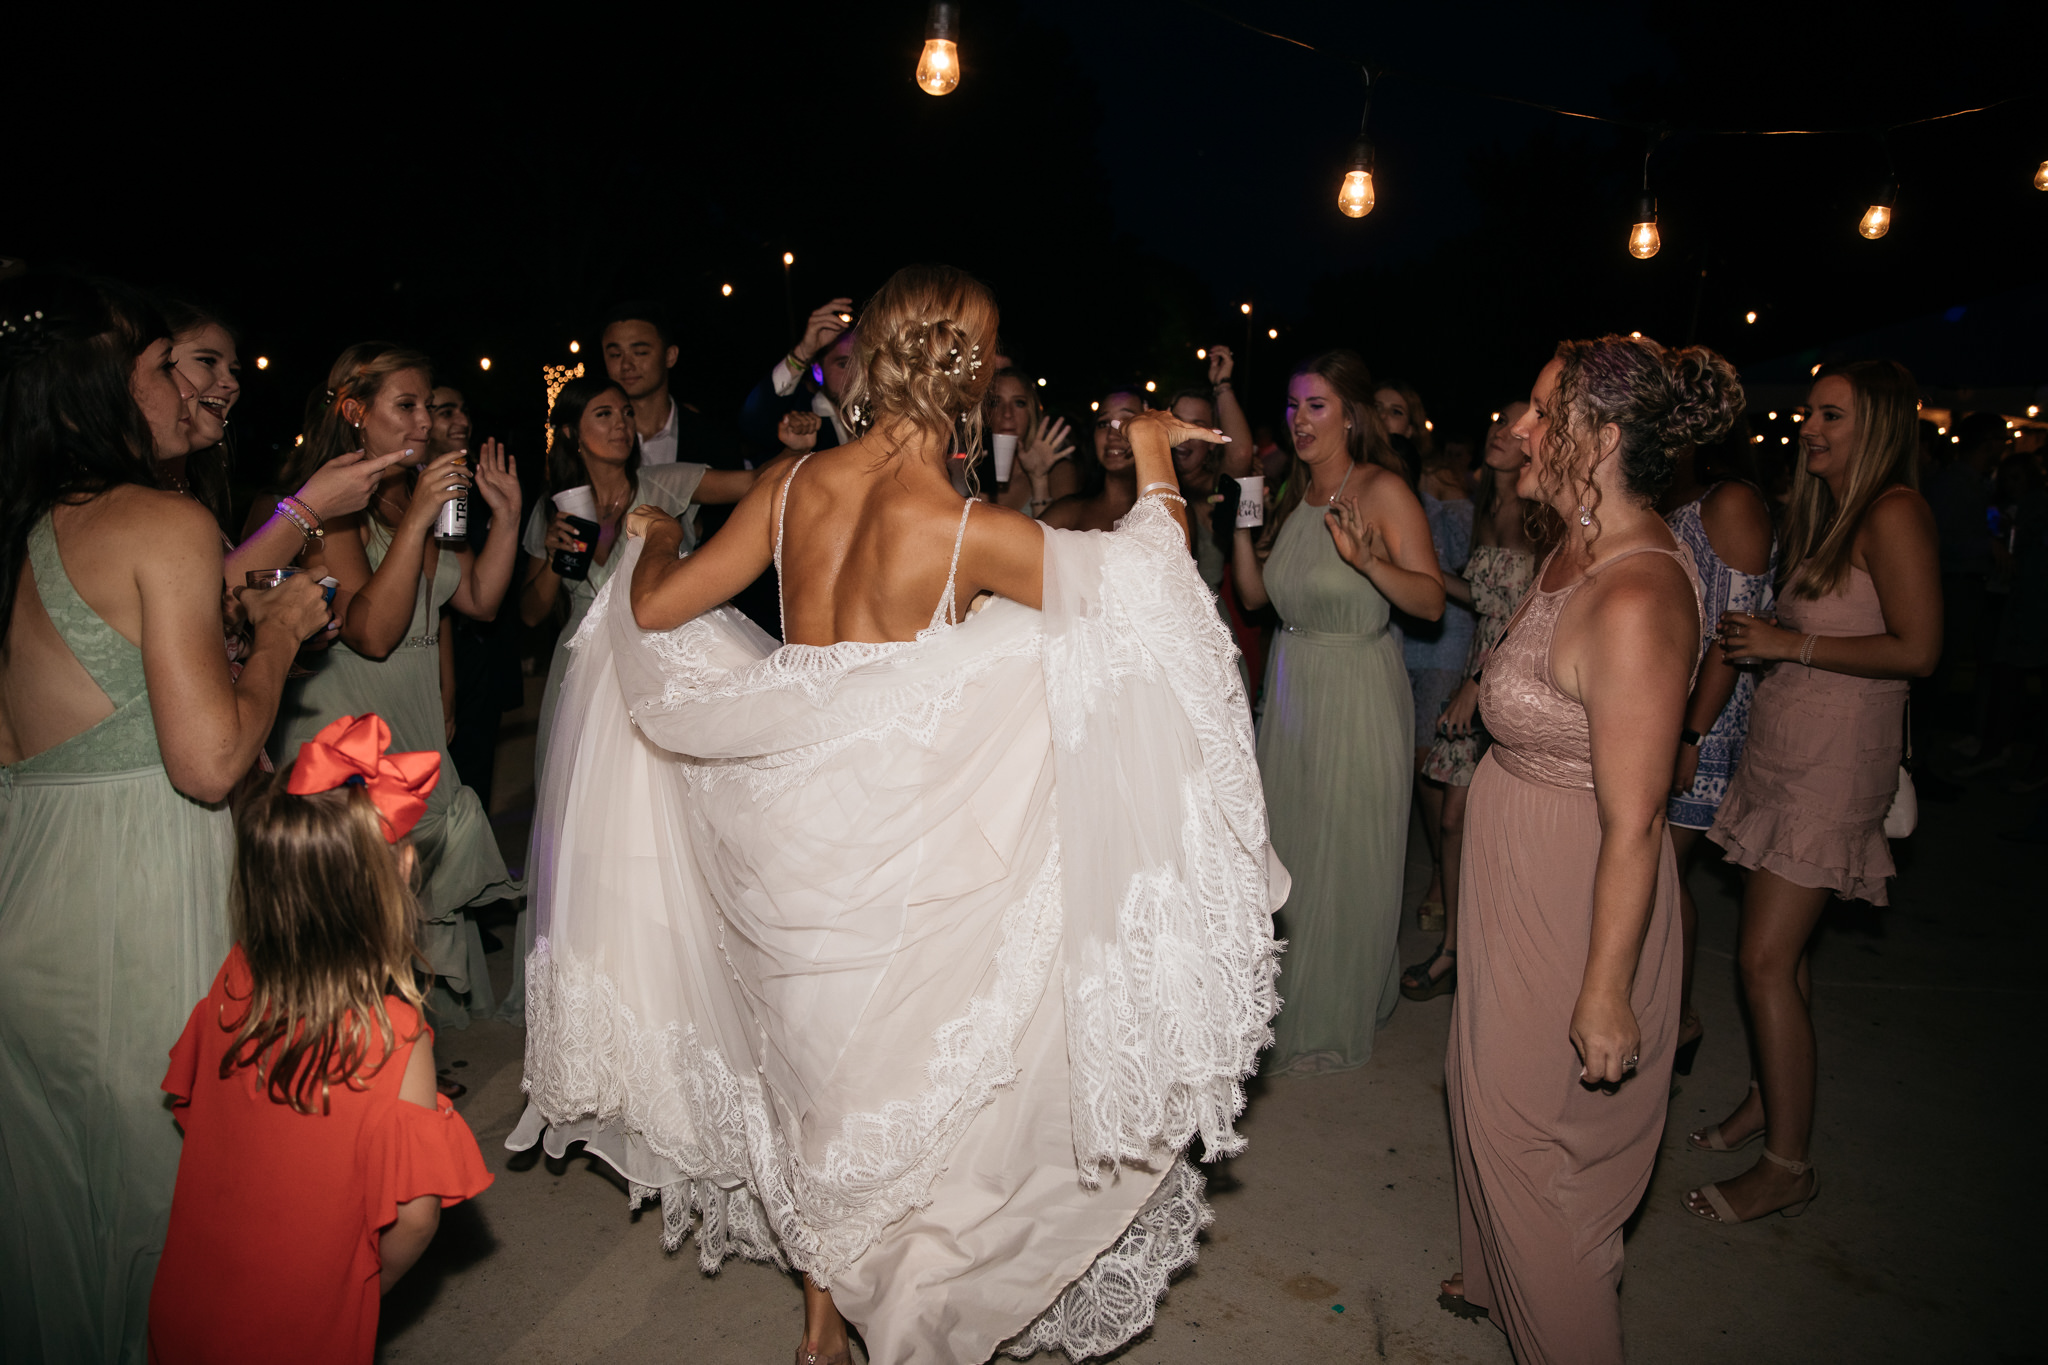 backyard-wedding-thewarmtharoundyou-lexy-branson-85.jpg